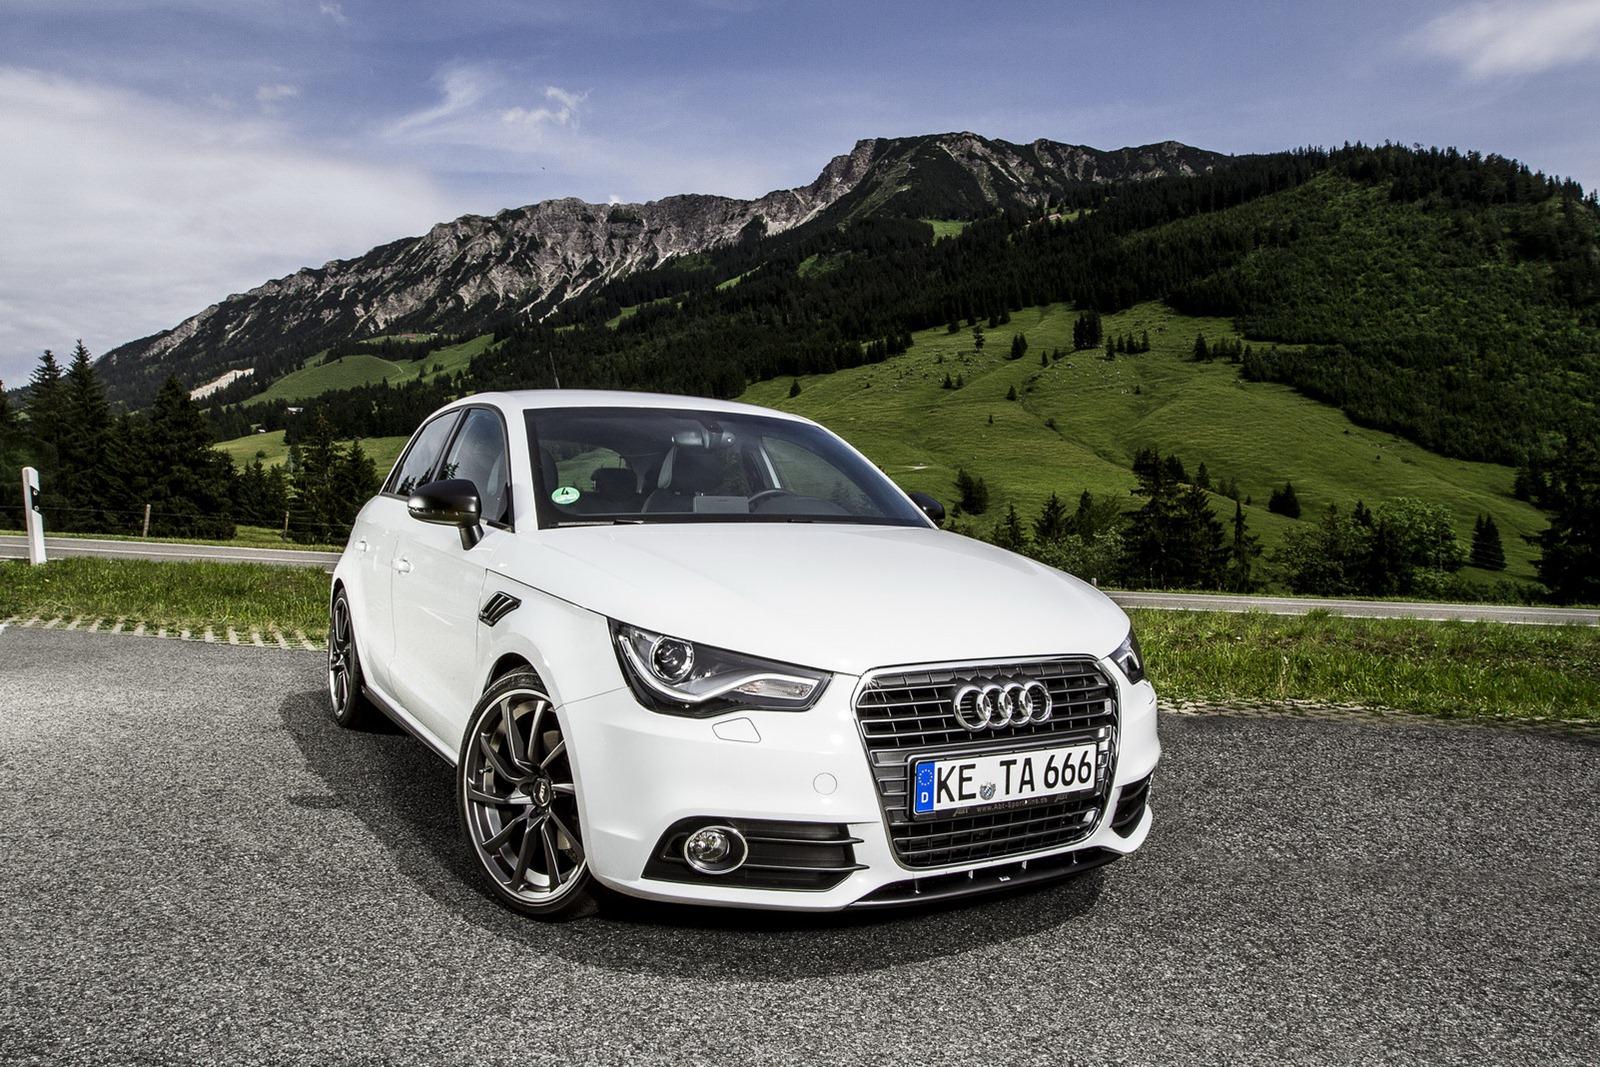 ABT Audi A1 Sportback Front 3/4 Angle